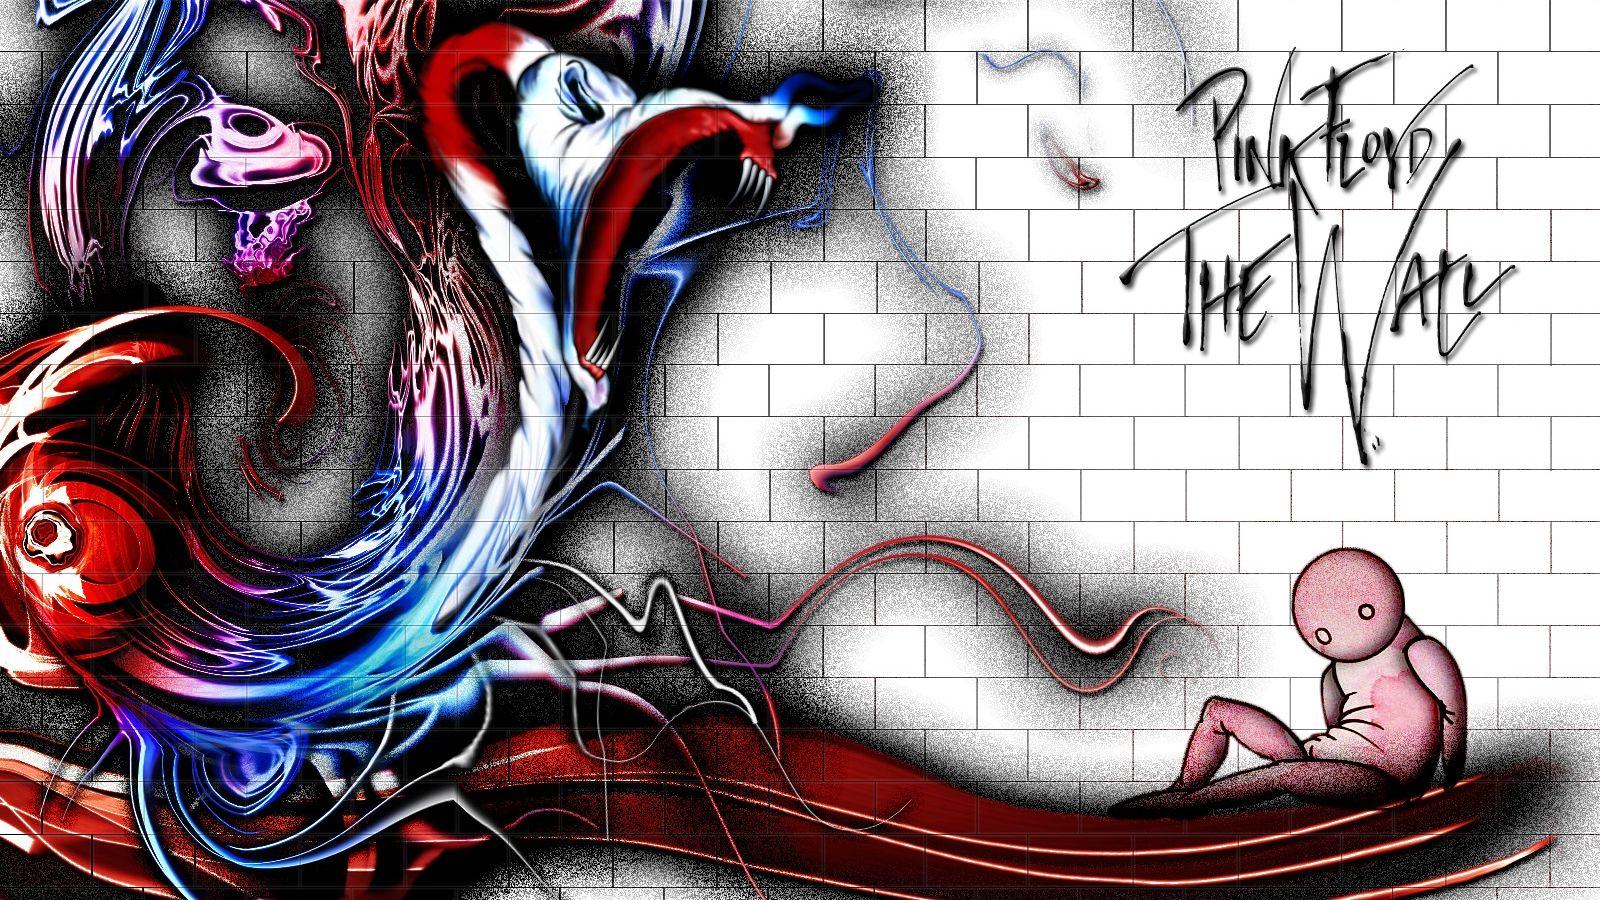 Pink Floyd Art Pink Floyd Wallpaper Pink Floyd Art Pink Floyd Albums